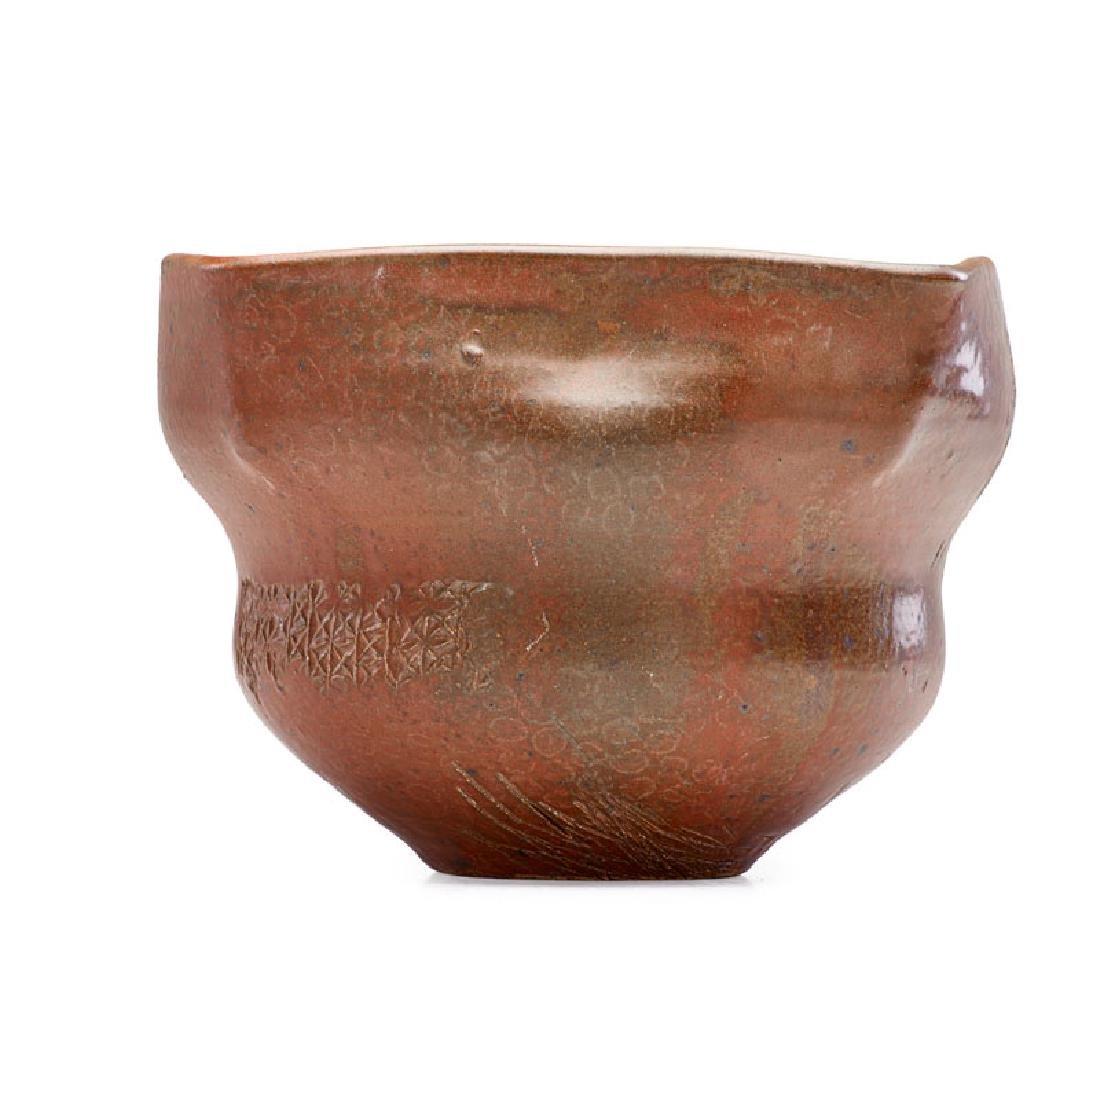 ROBERT TURNER Stoneware vessel - 3